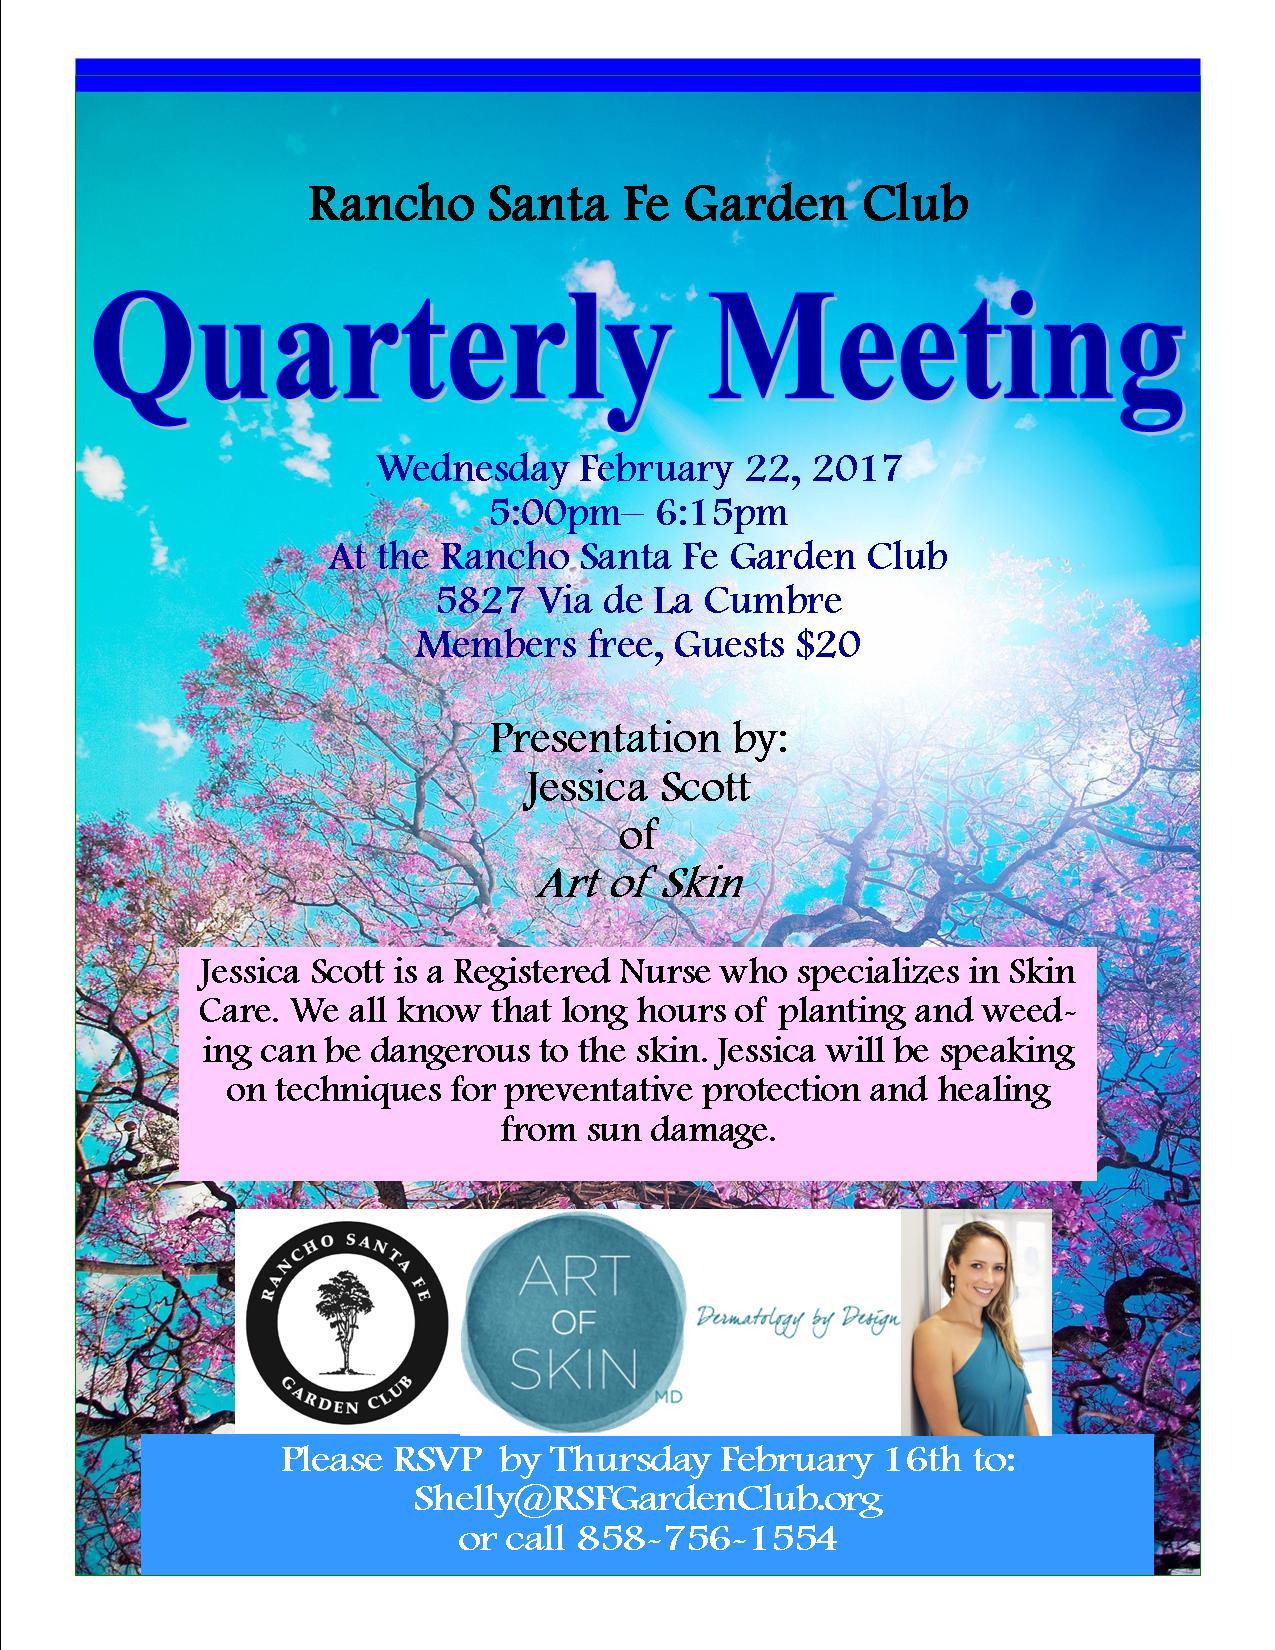 Quarterly-Meeting-Flyer-0202217-3.jpg